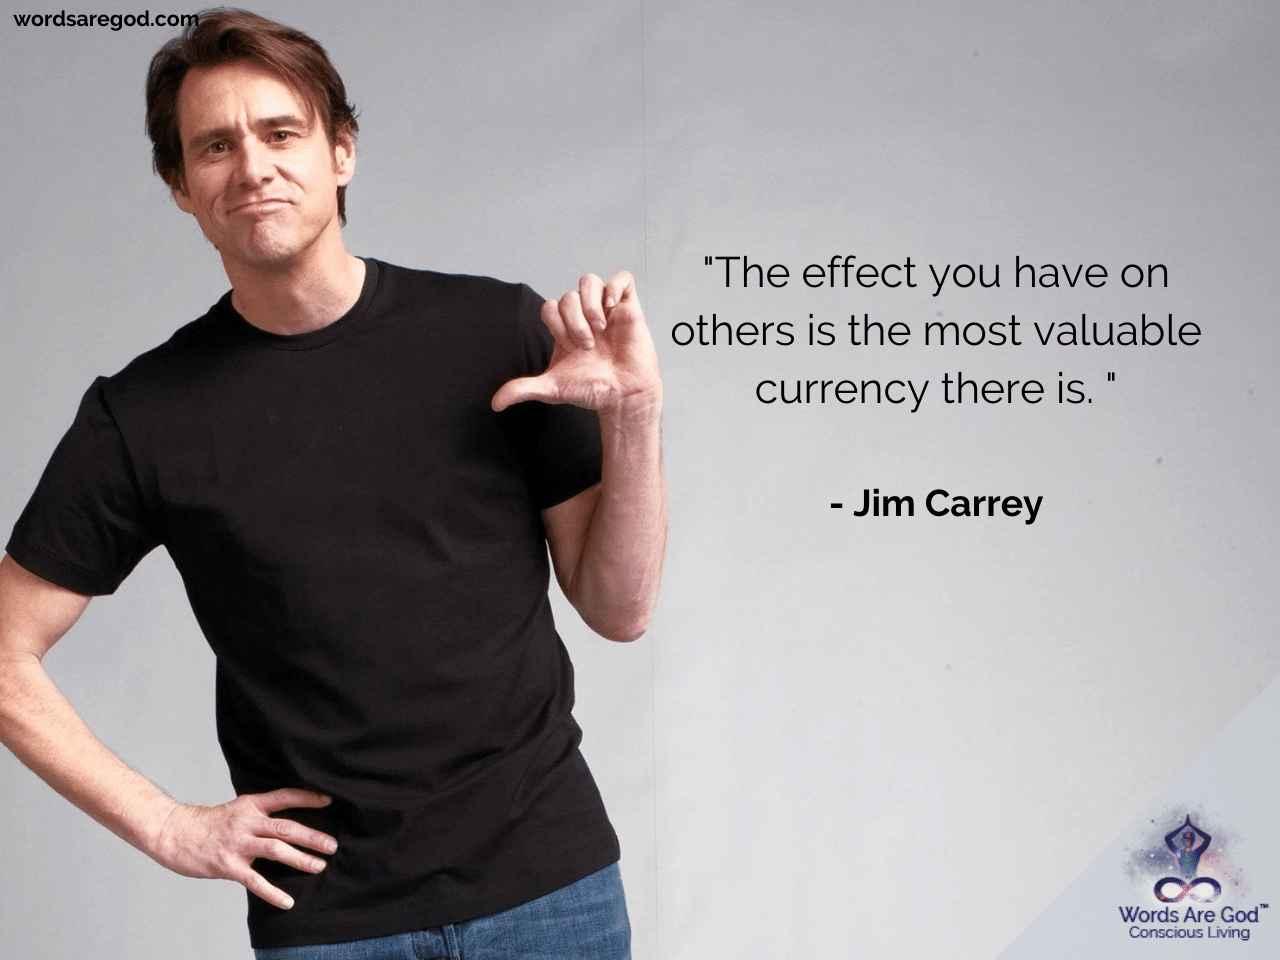 Jim Carrey Motivational Quotes